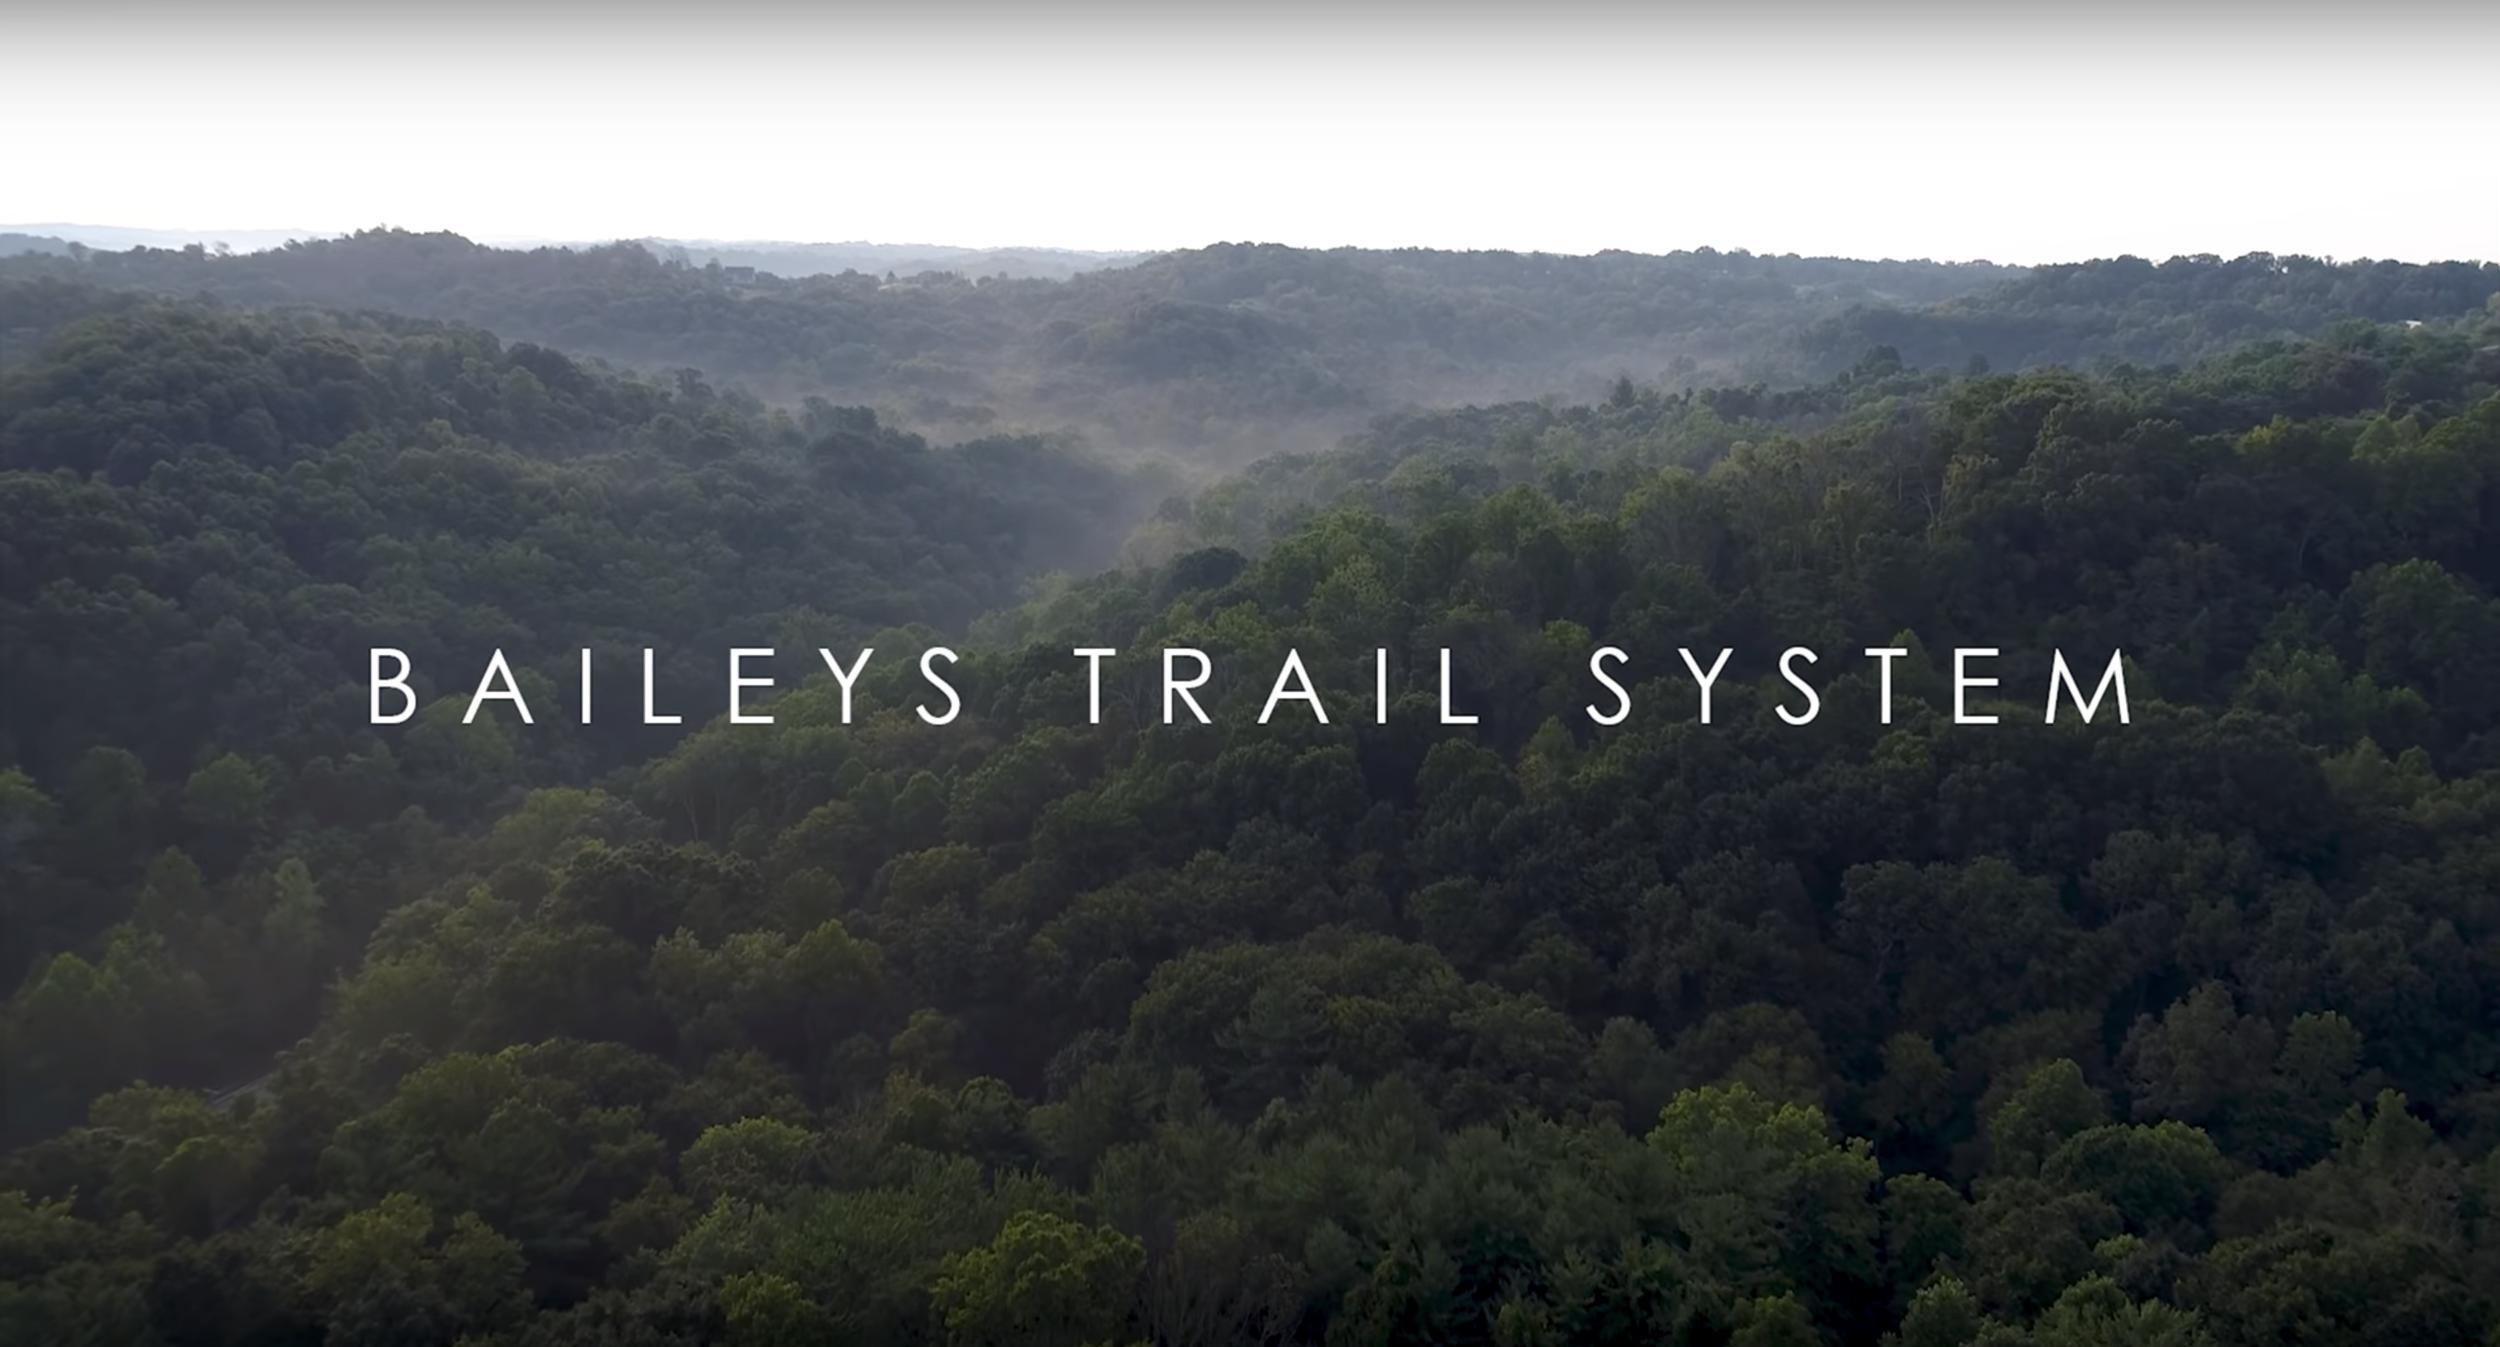 Ohio University Project Video  (2:20)